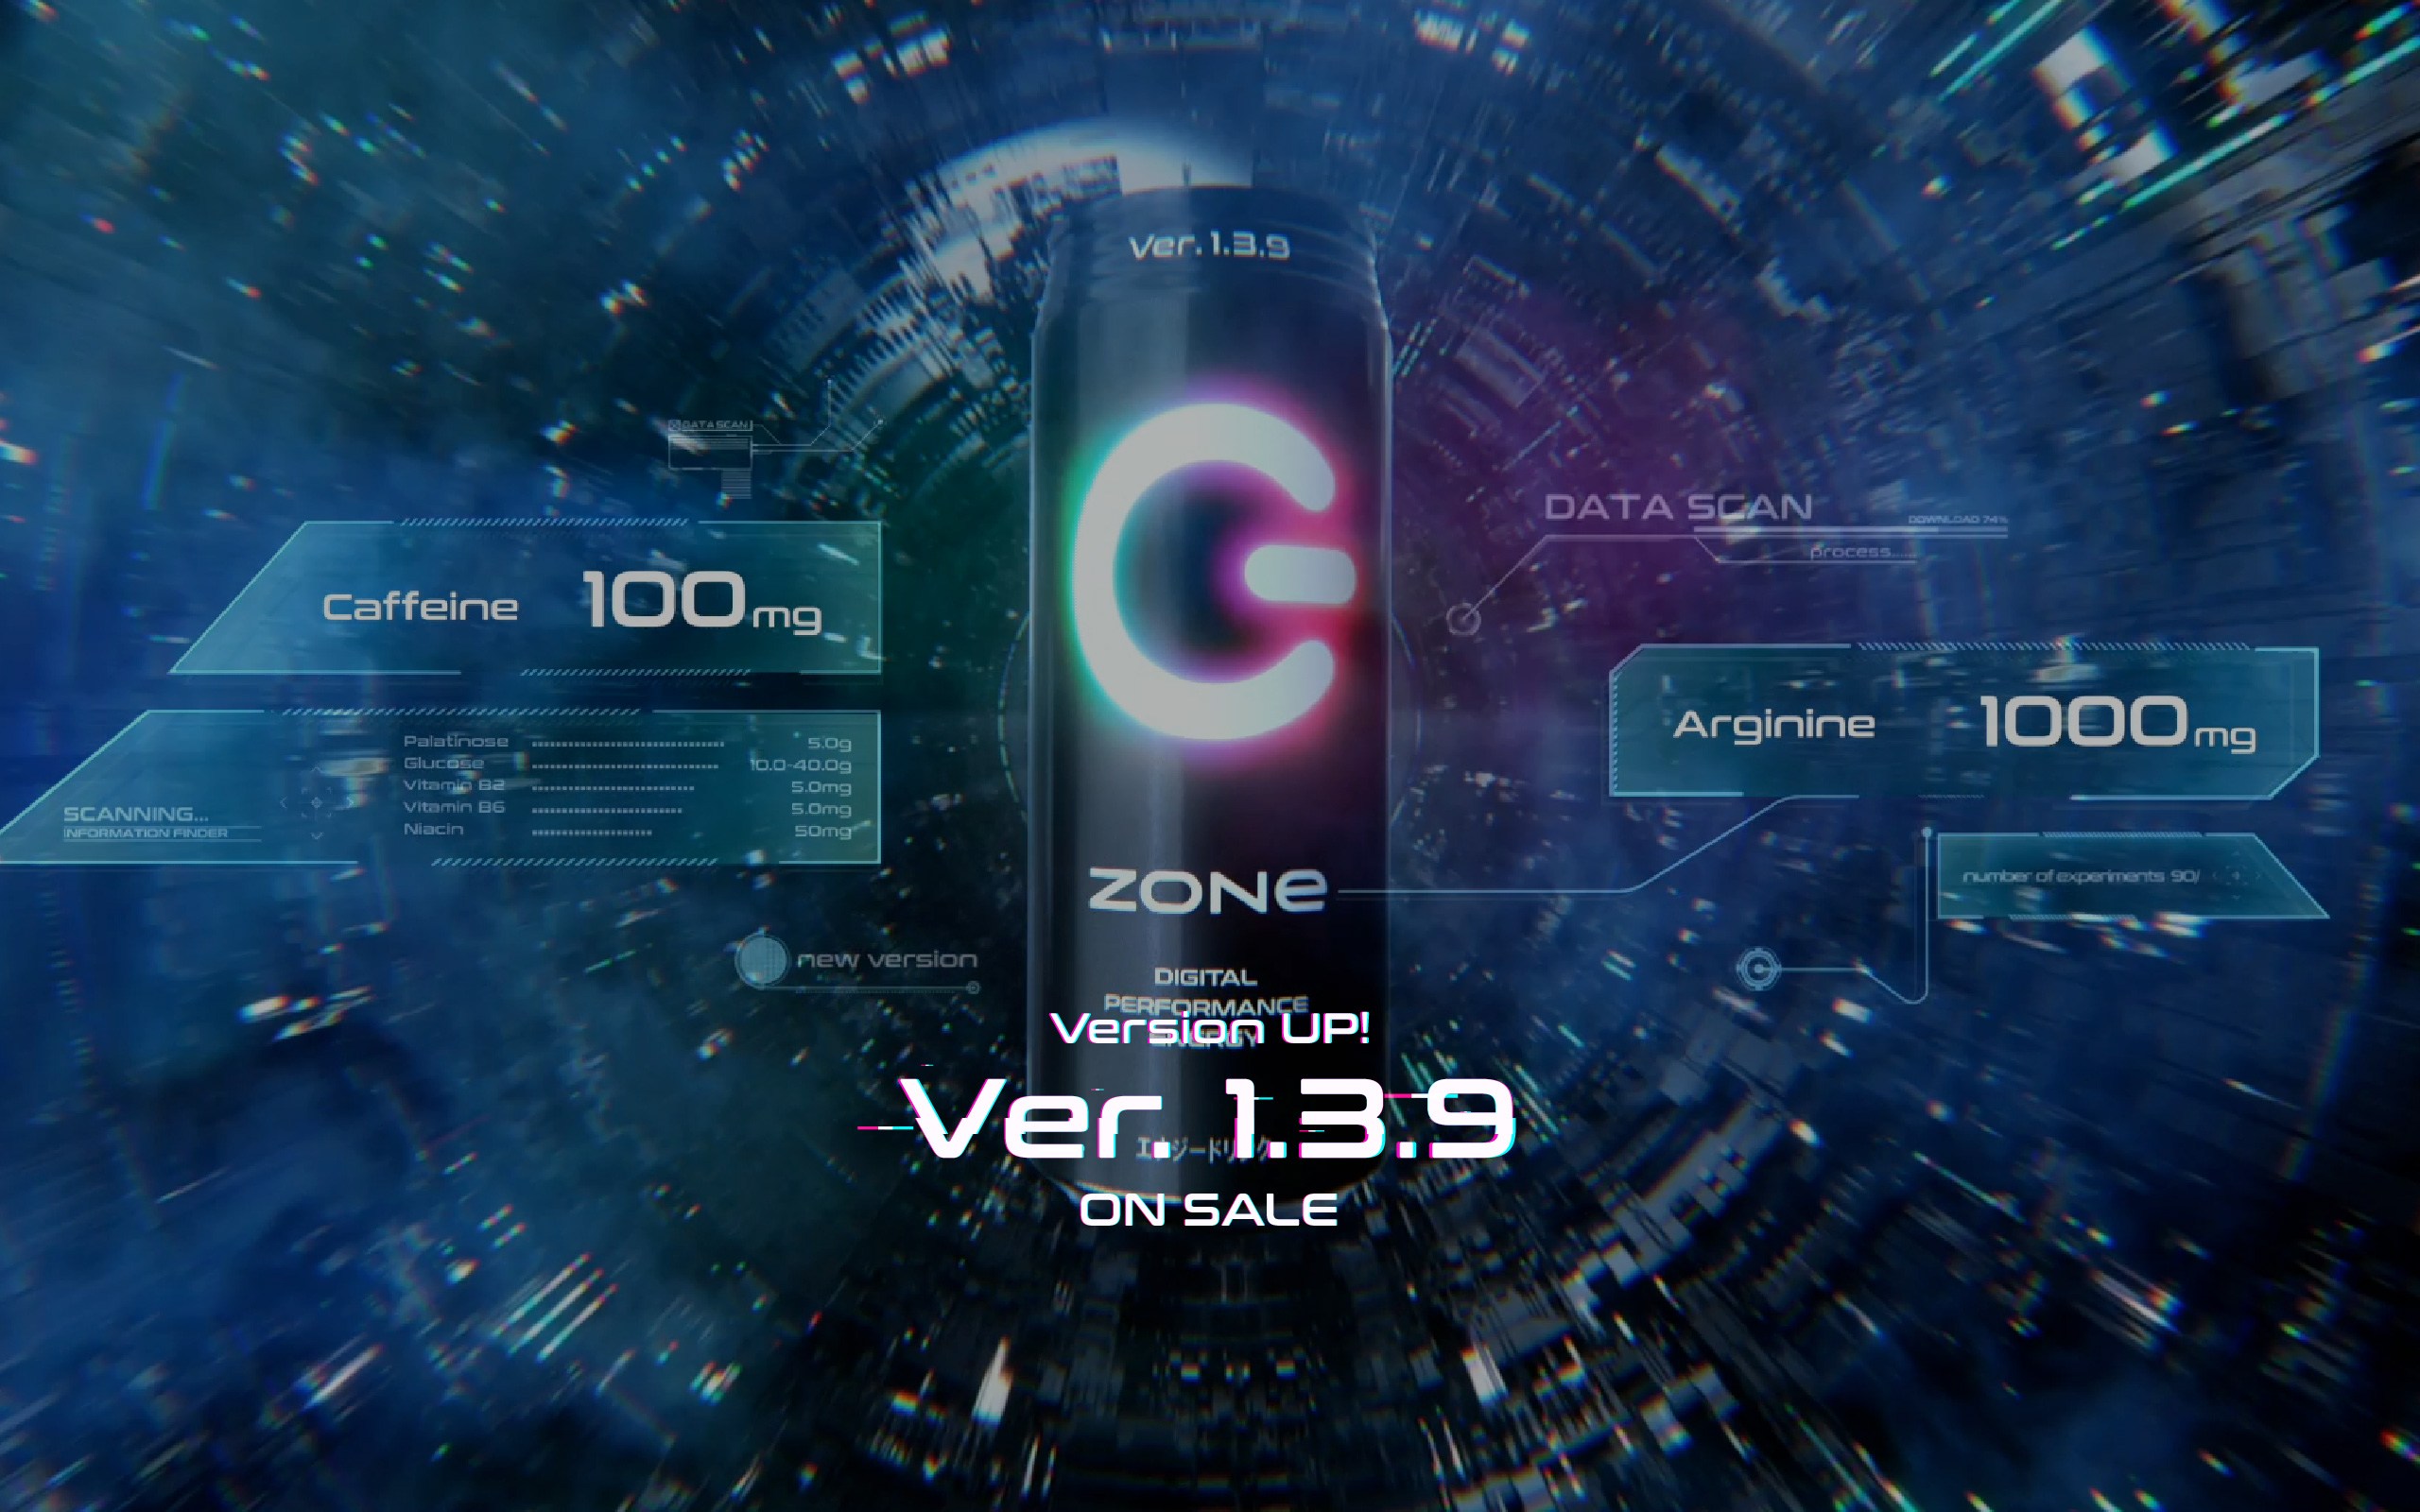 ZONe Ver.1.3.9  Version UP!